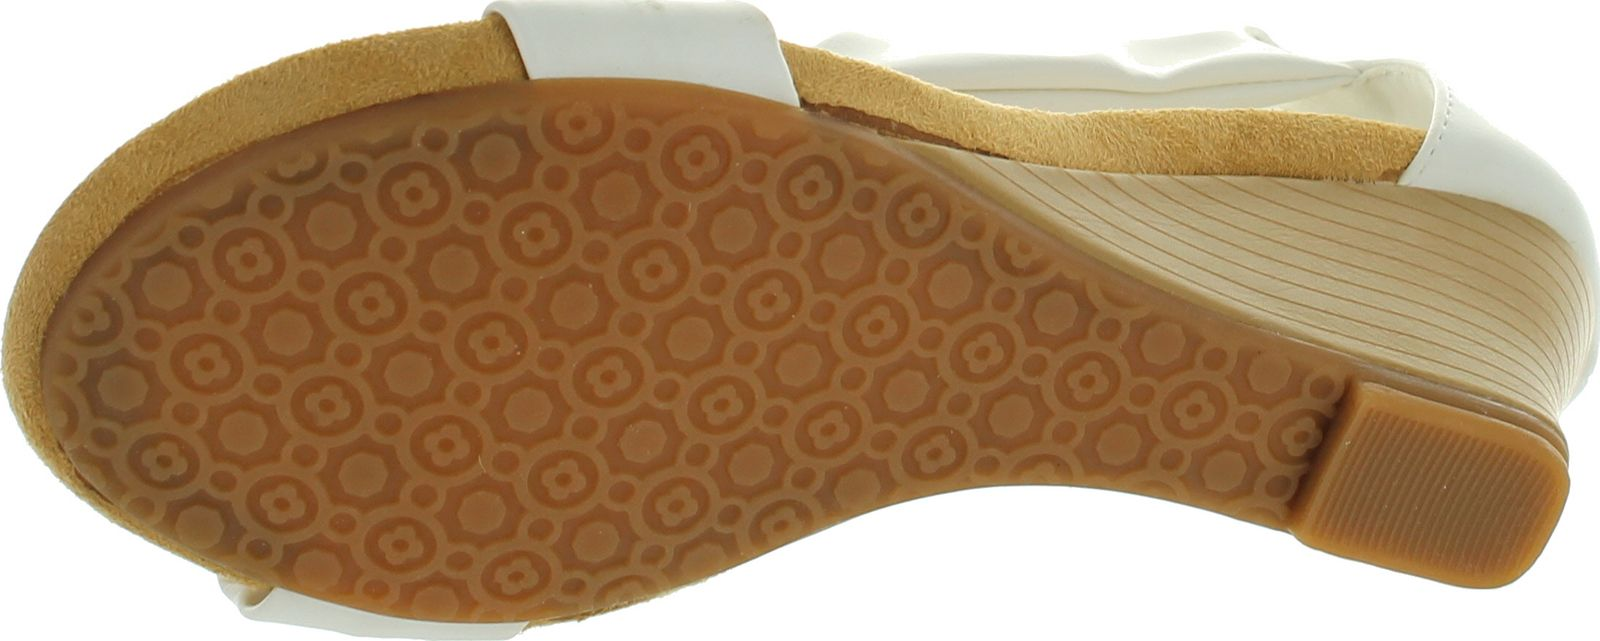 thumbnail 20 - PATRIZIA by Spring Step Womens Harlequin Fashion Wedge Sandals